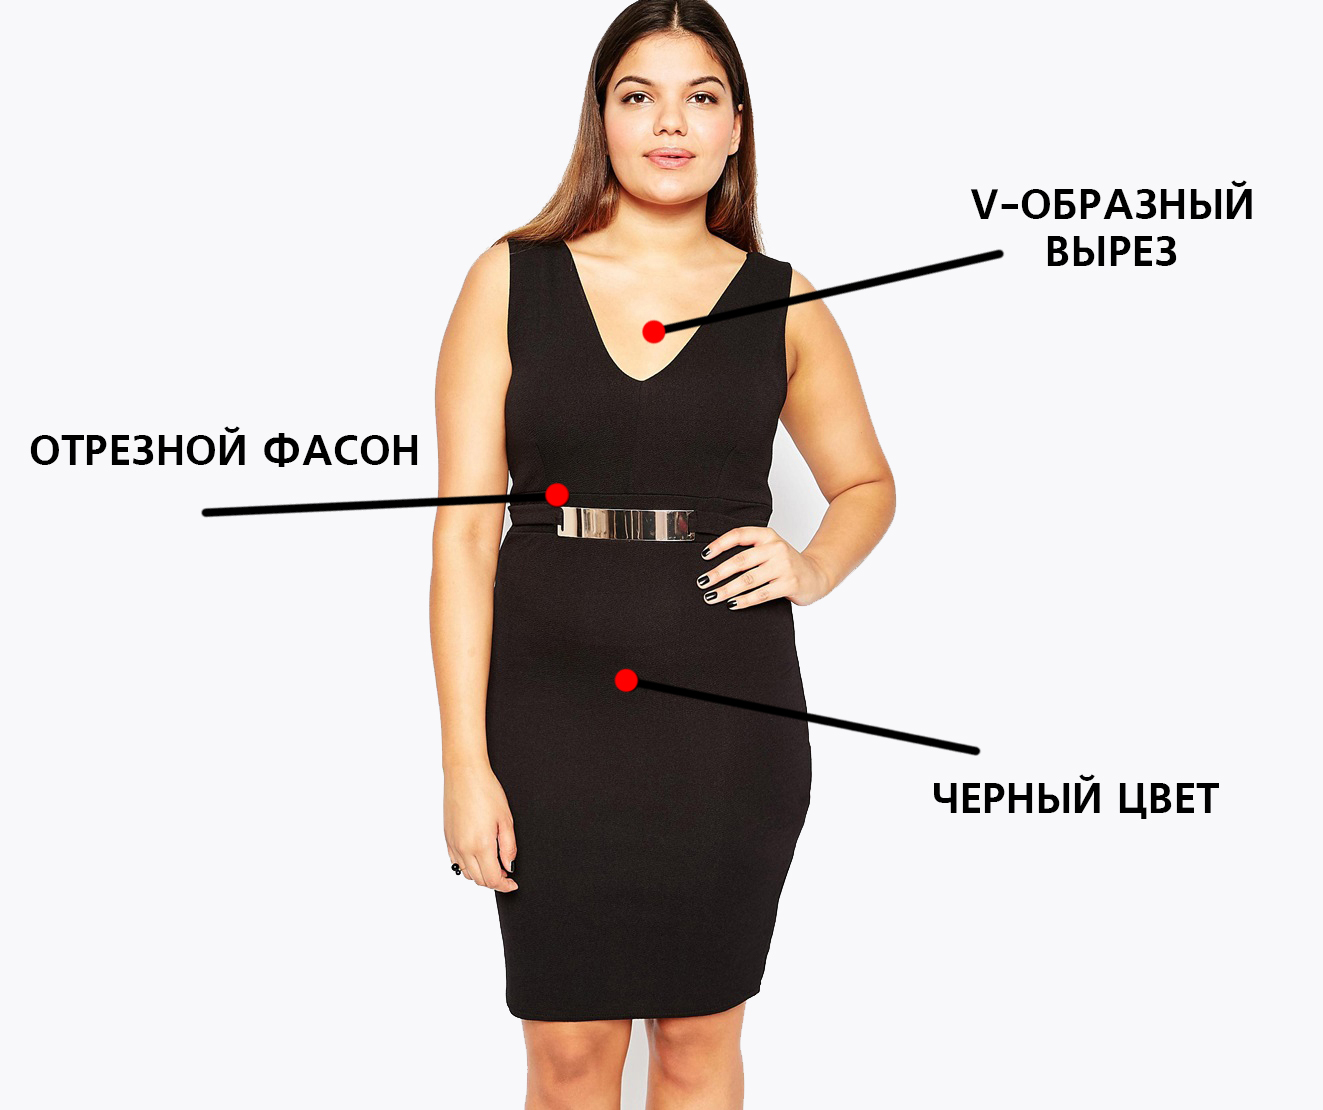 Нестандартная фигура платье фото